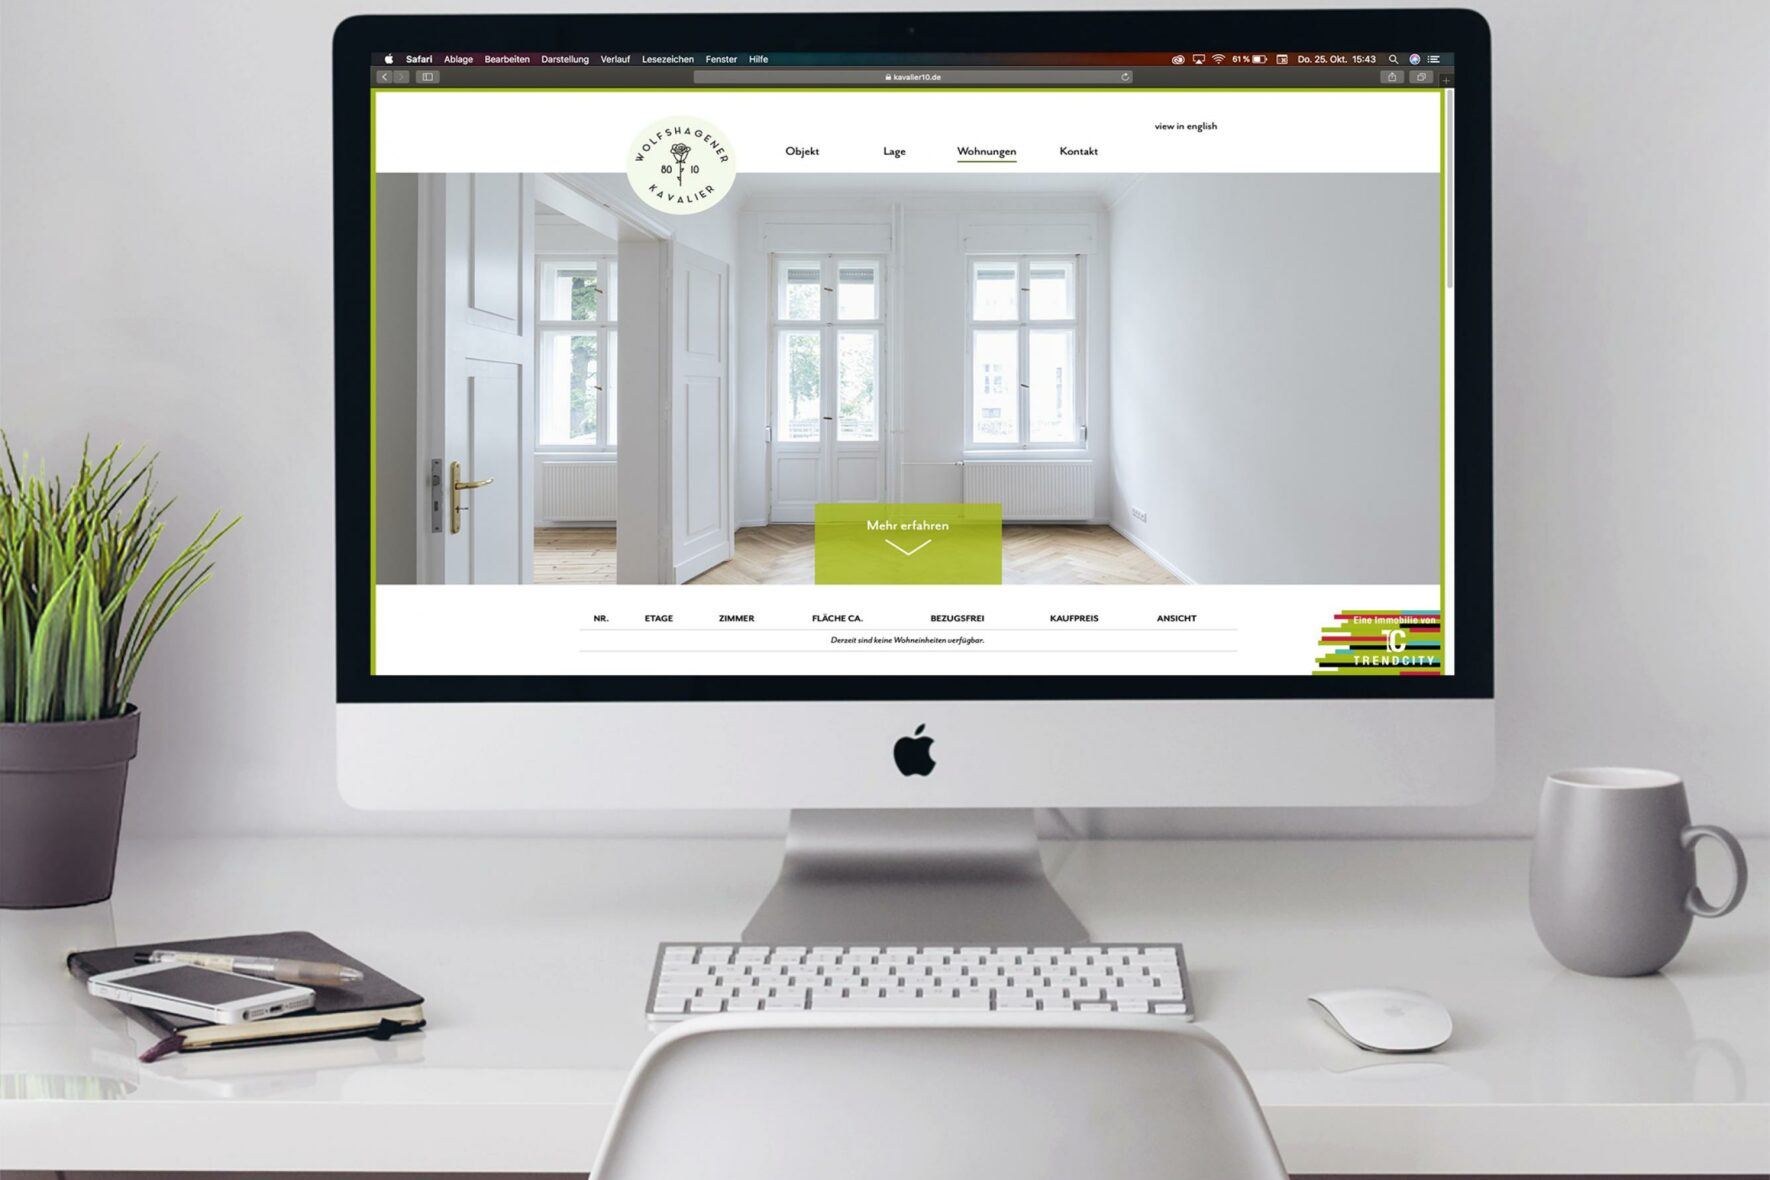 Webiste-Objekte-Branding-Trendcity-Immobilien-Kavalierstrasse-Webdesign-Corporat-Design-3